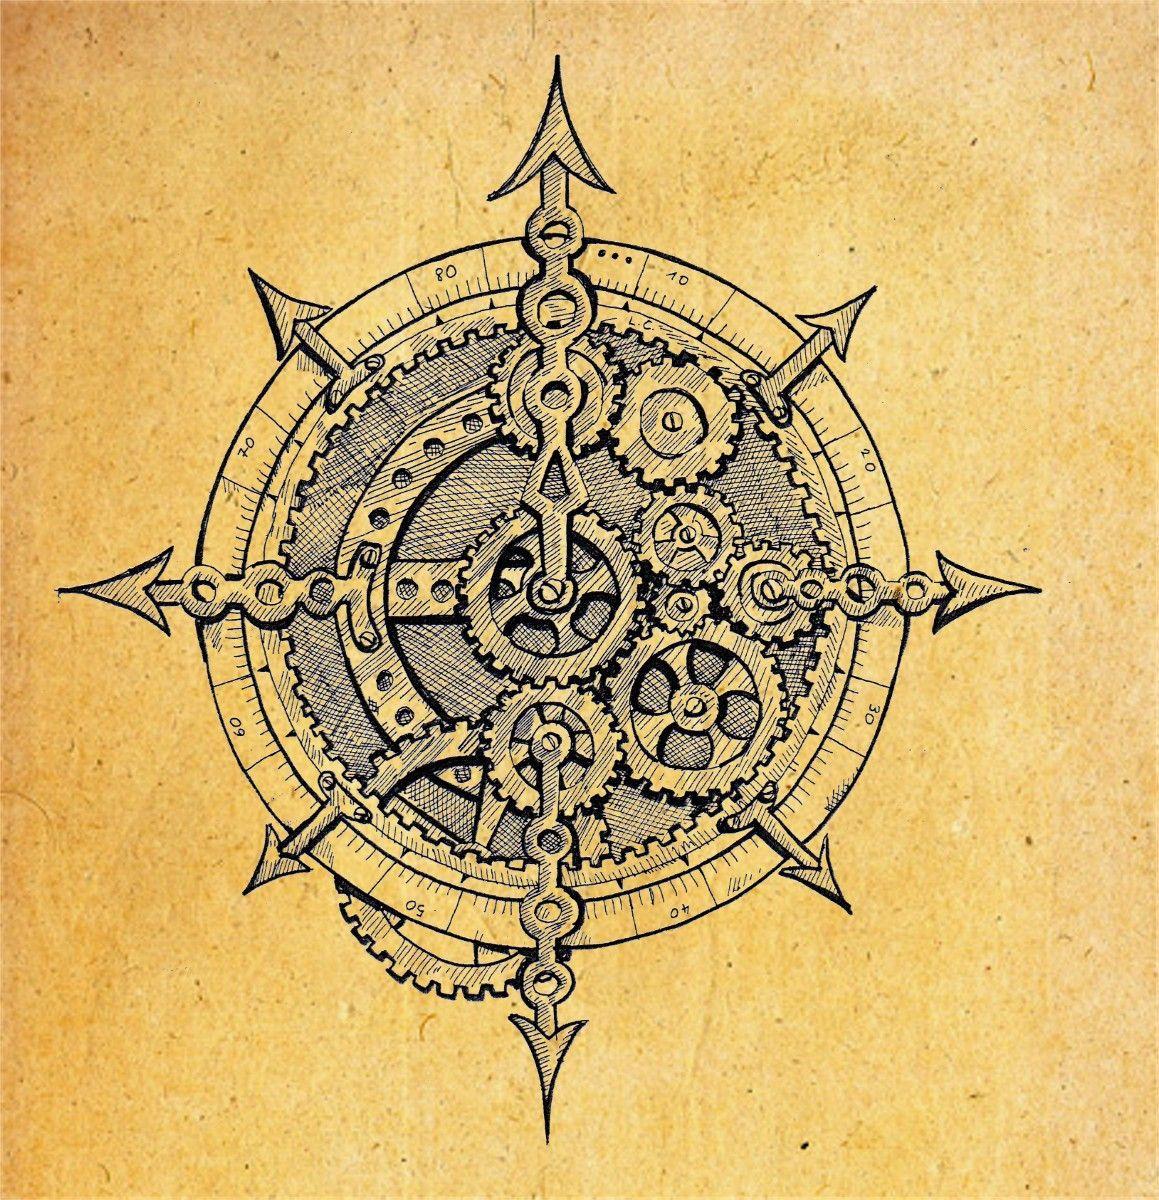 картинки тату компаса вас съемный объектив